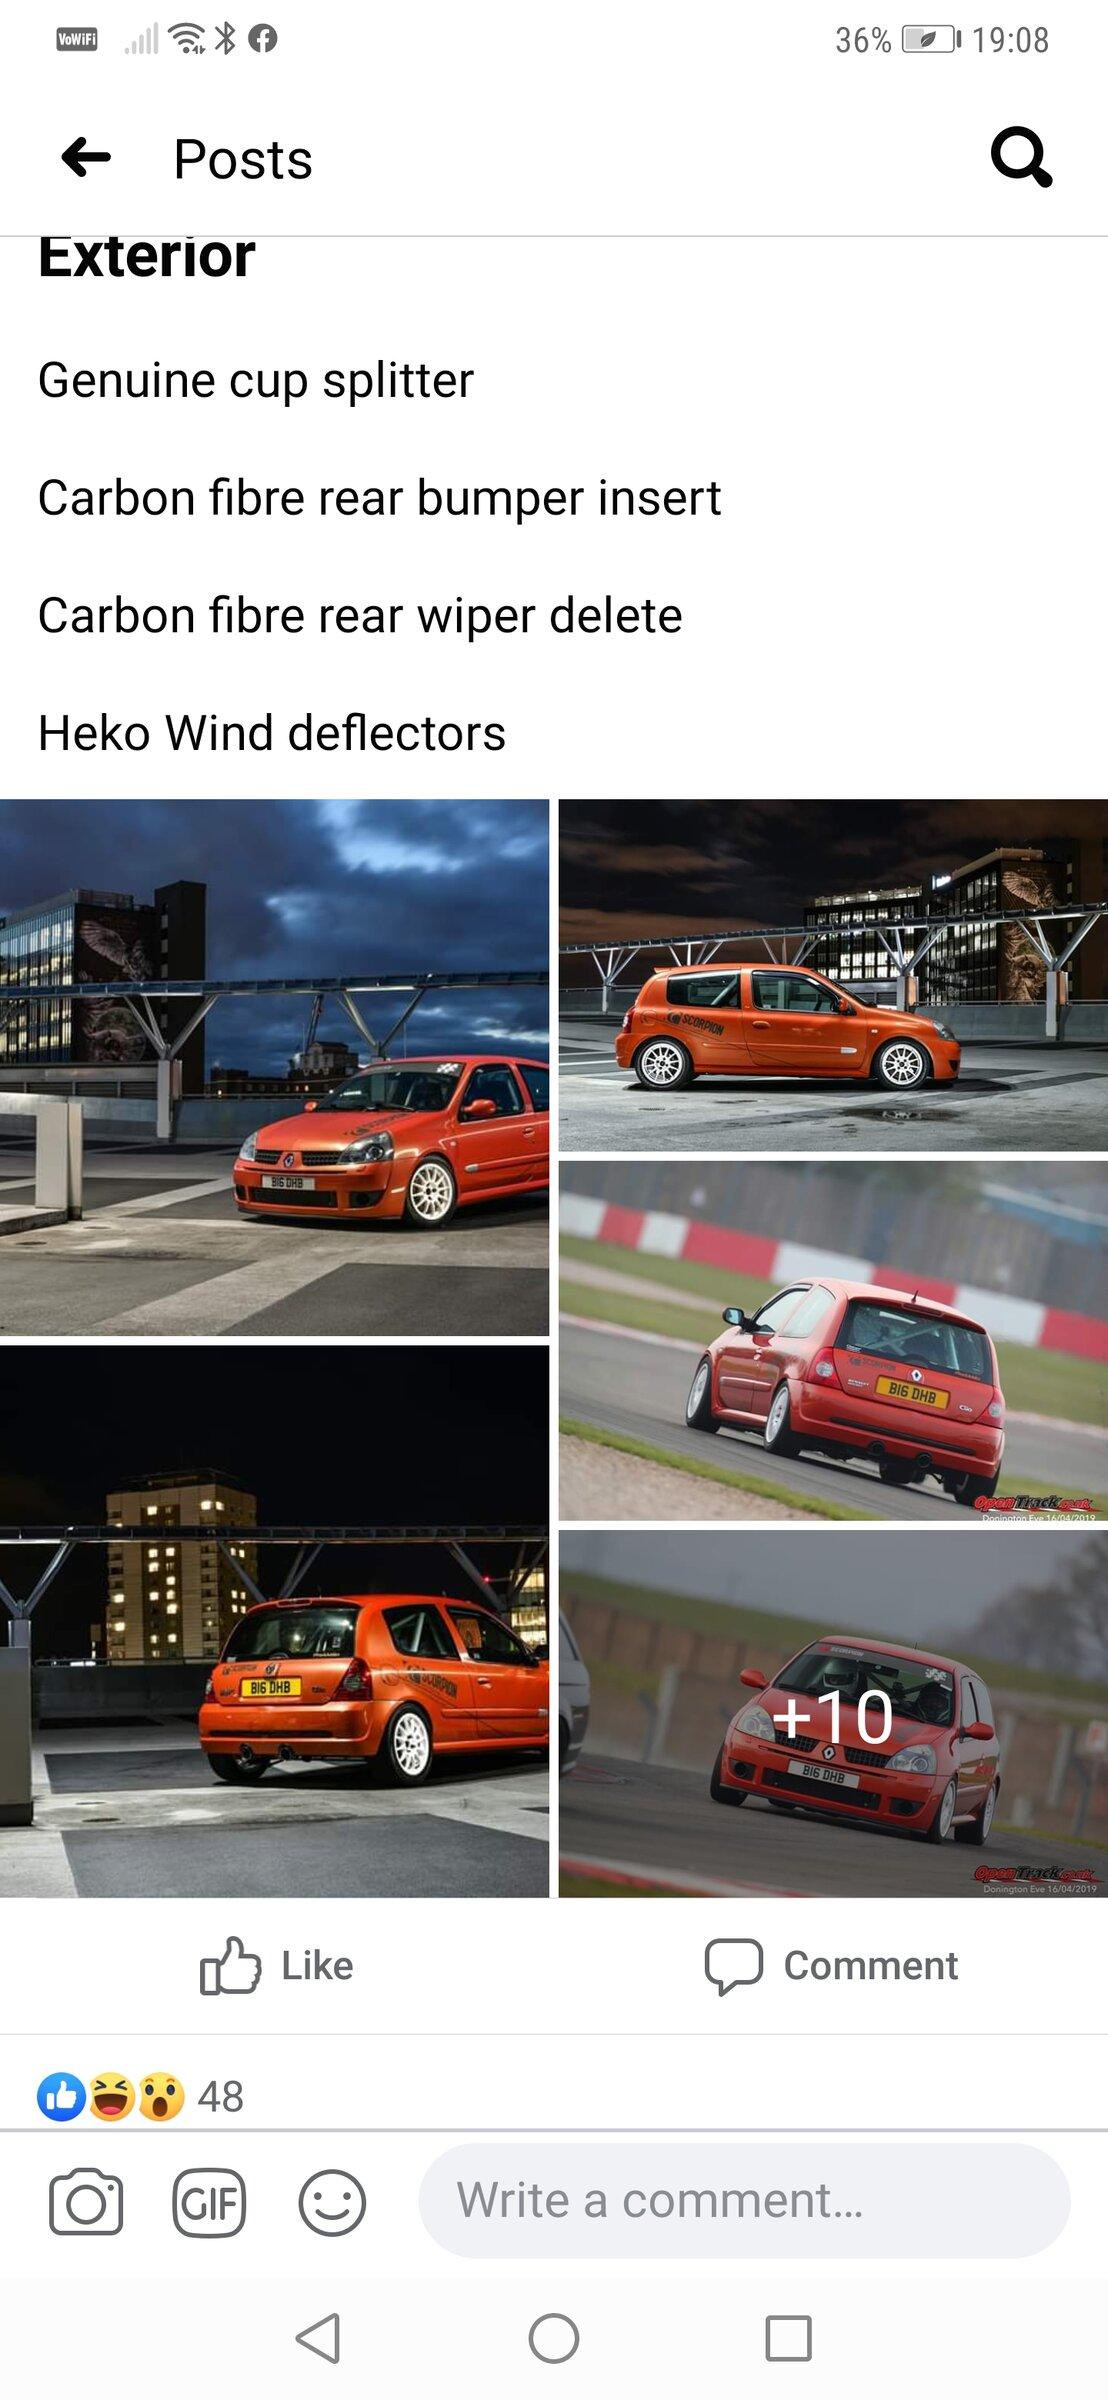 Screenshot_20200608_190818_com.facebook.katana.jpg